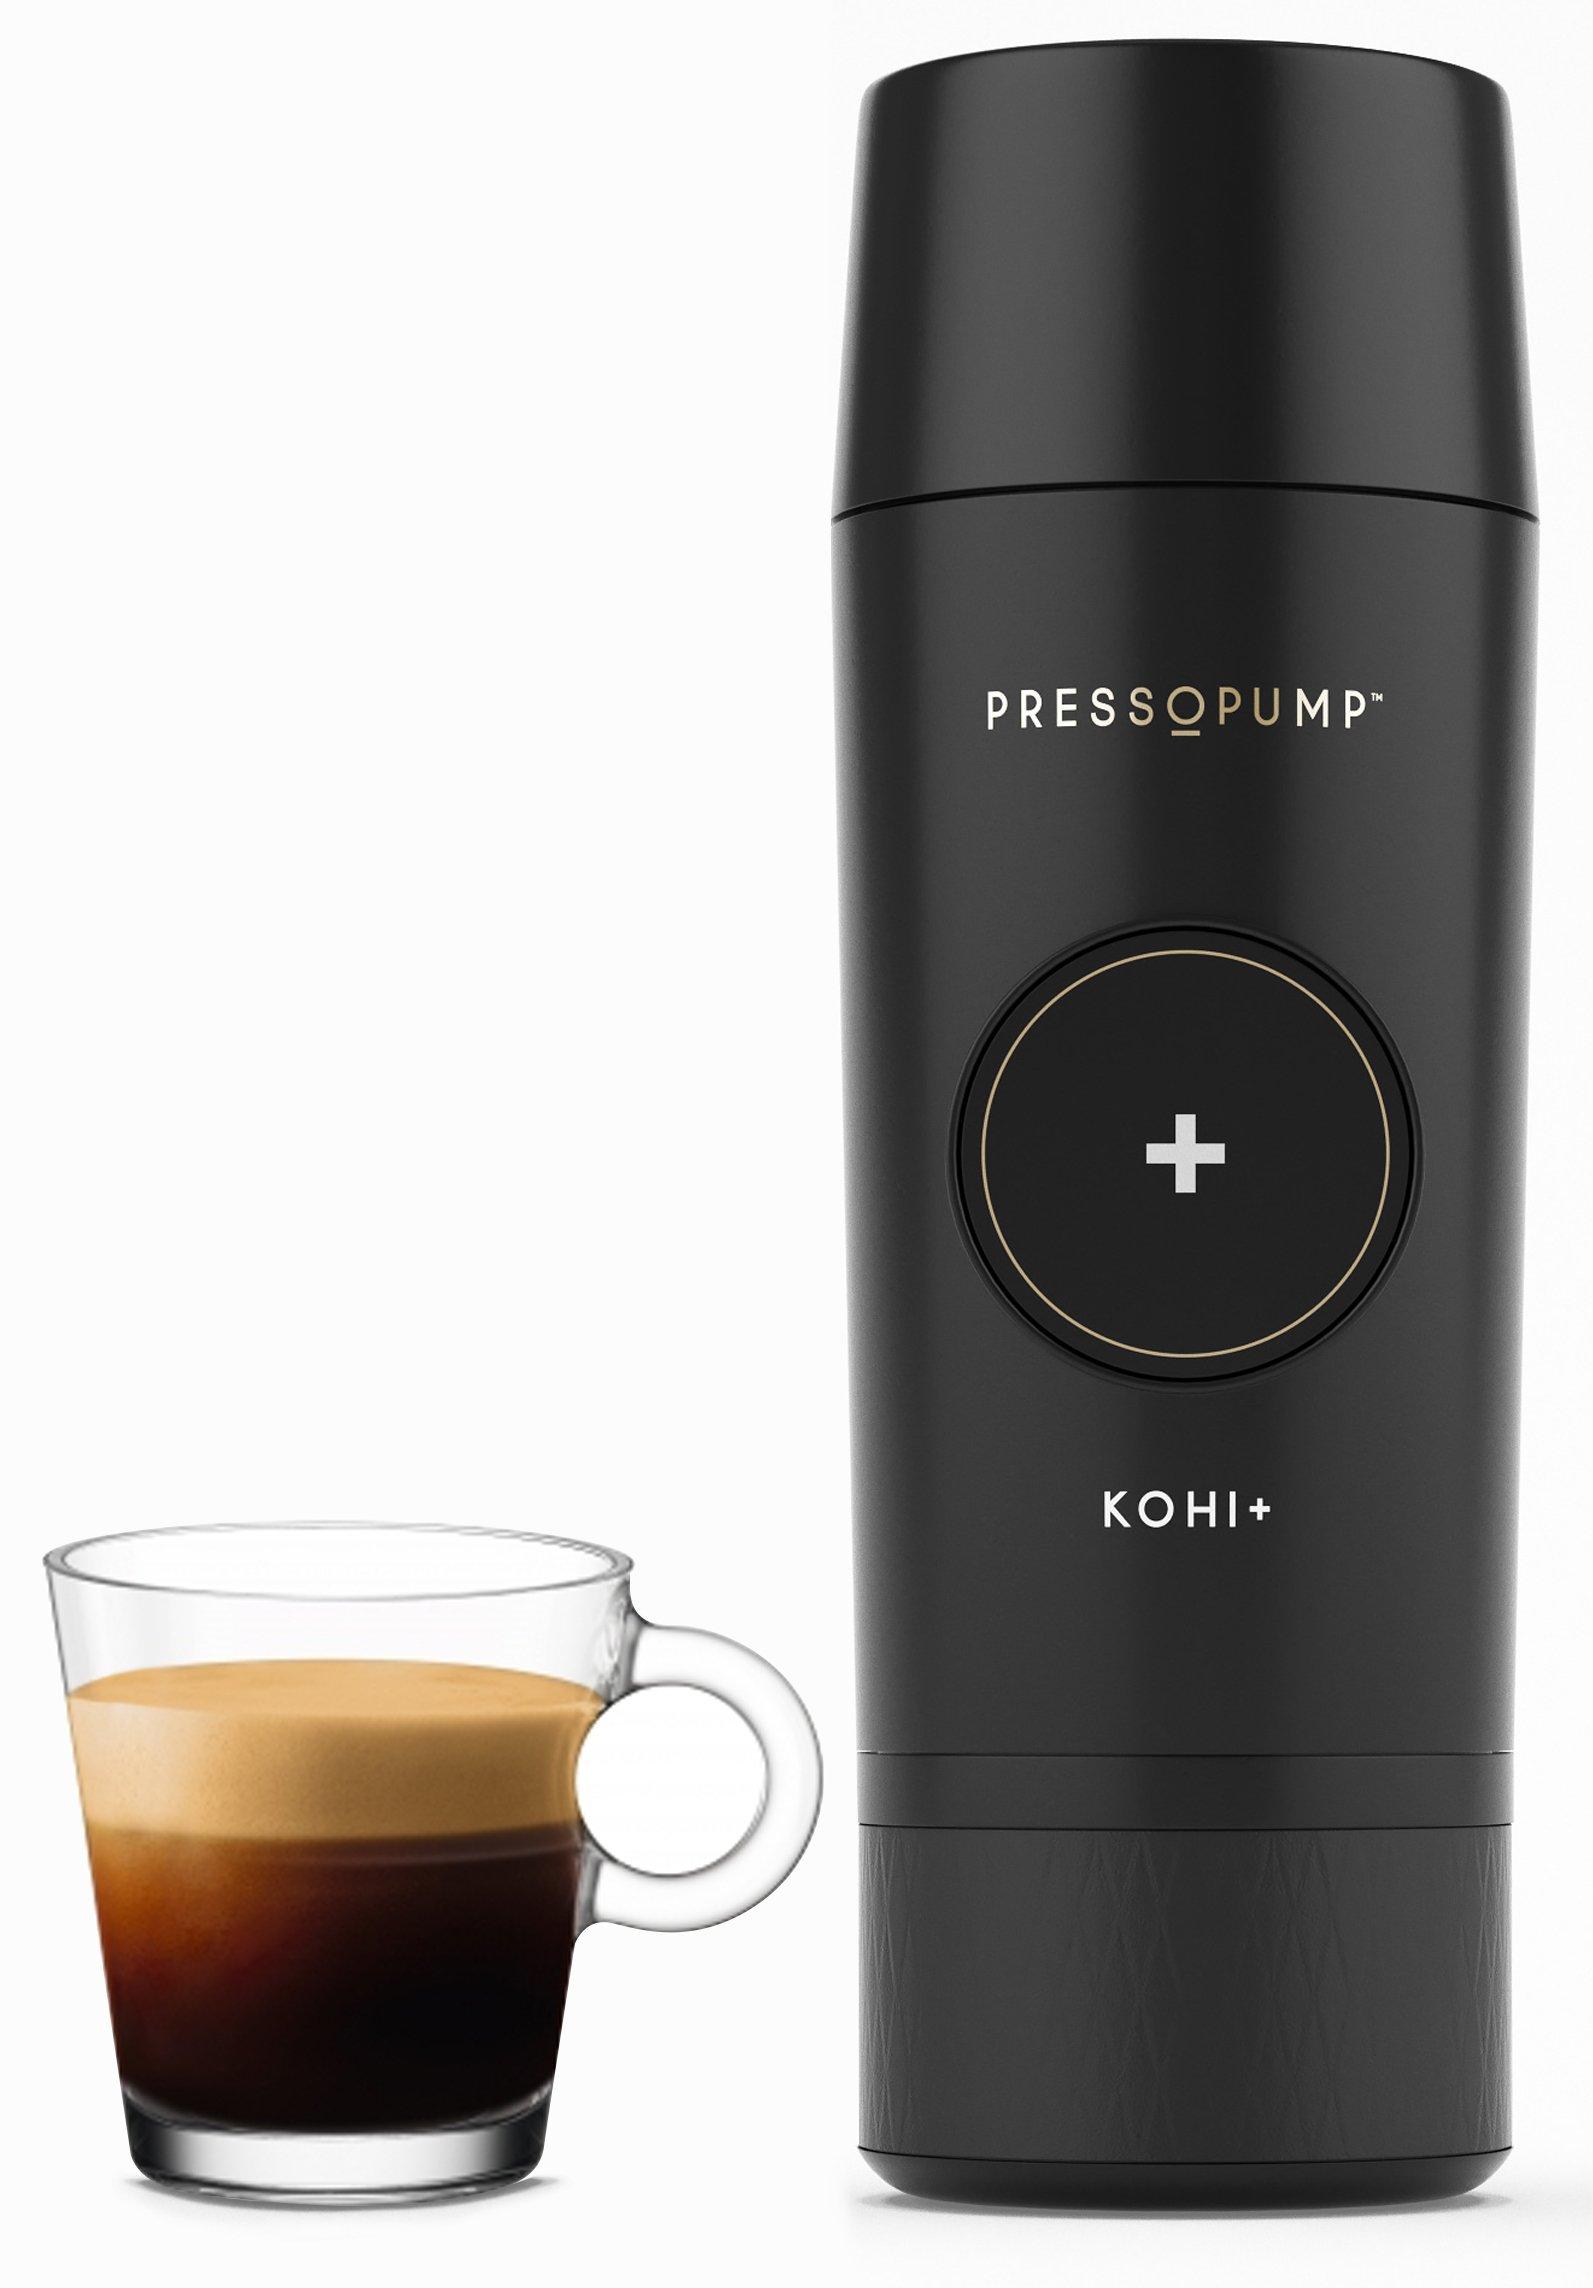 PRESSOPUMP Cordless Espresso Maker (Automatic) | Mini Espresso Coffee Machine | Perfect Gift for Home, Outdoors and Office | Black